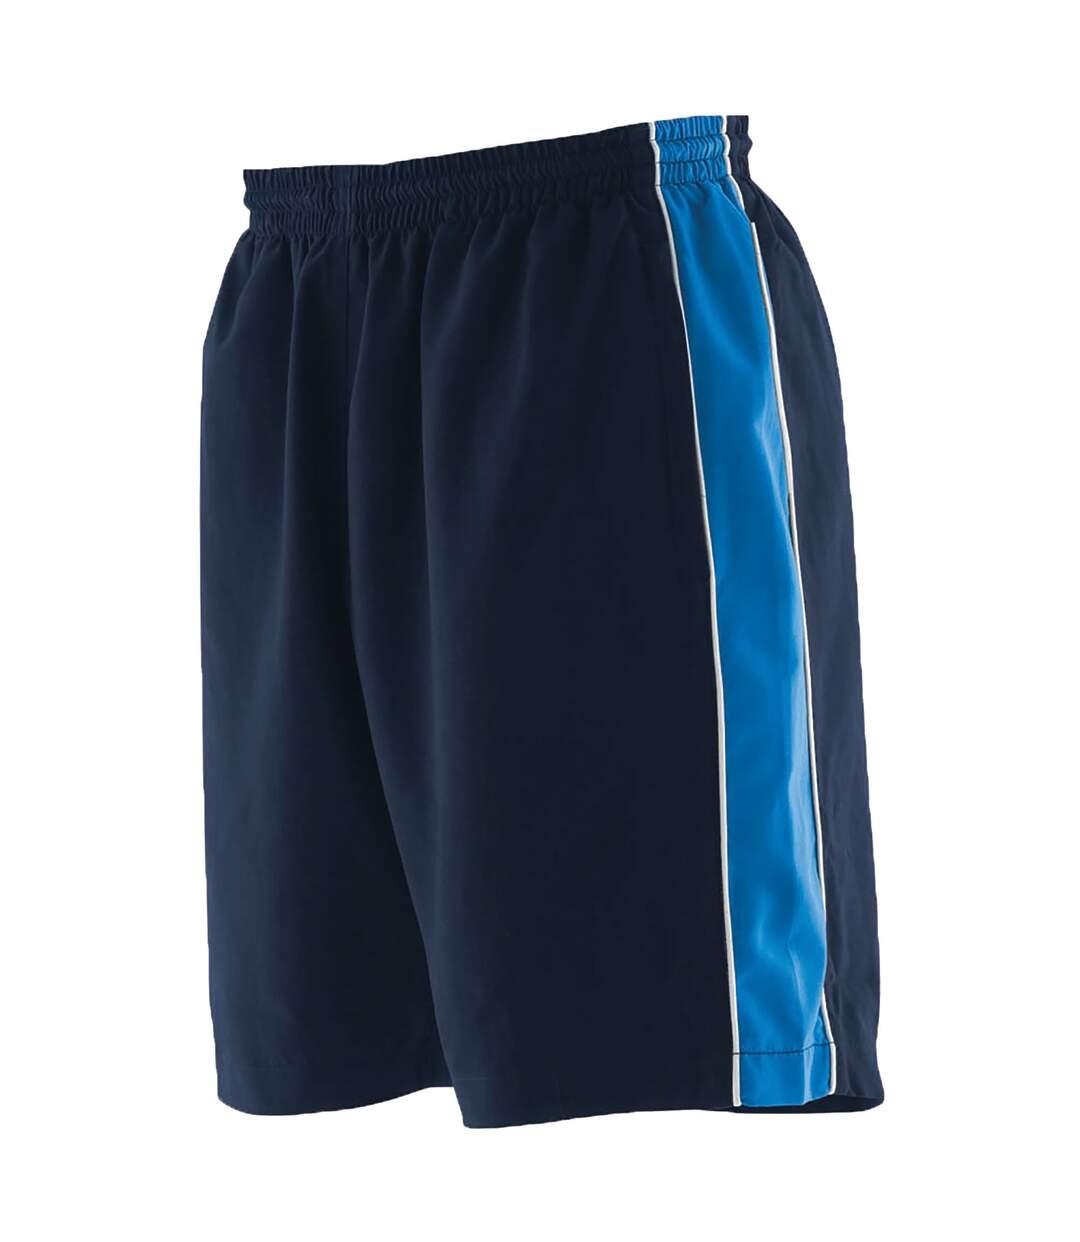 Finden & Hales - Short de sport - Homme (Bleu marine/Bleu roi/Blanc) - UTRW458